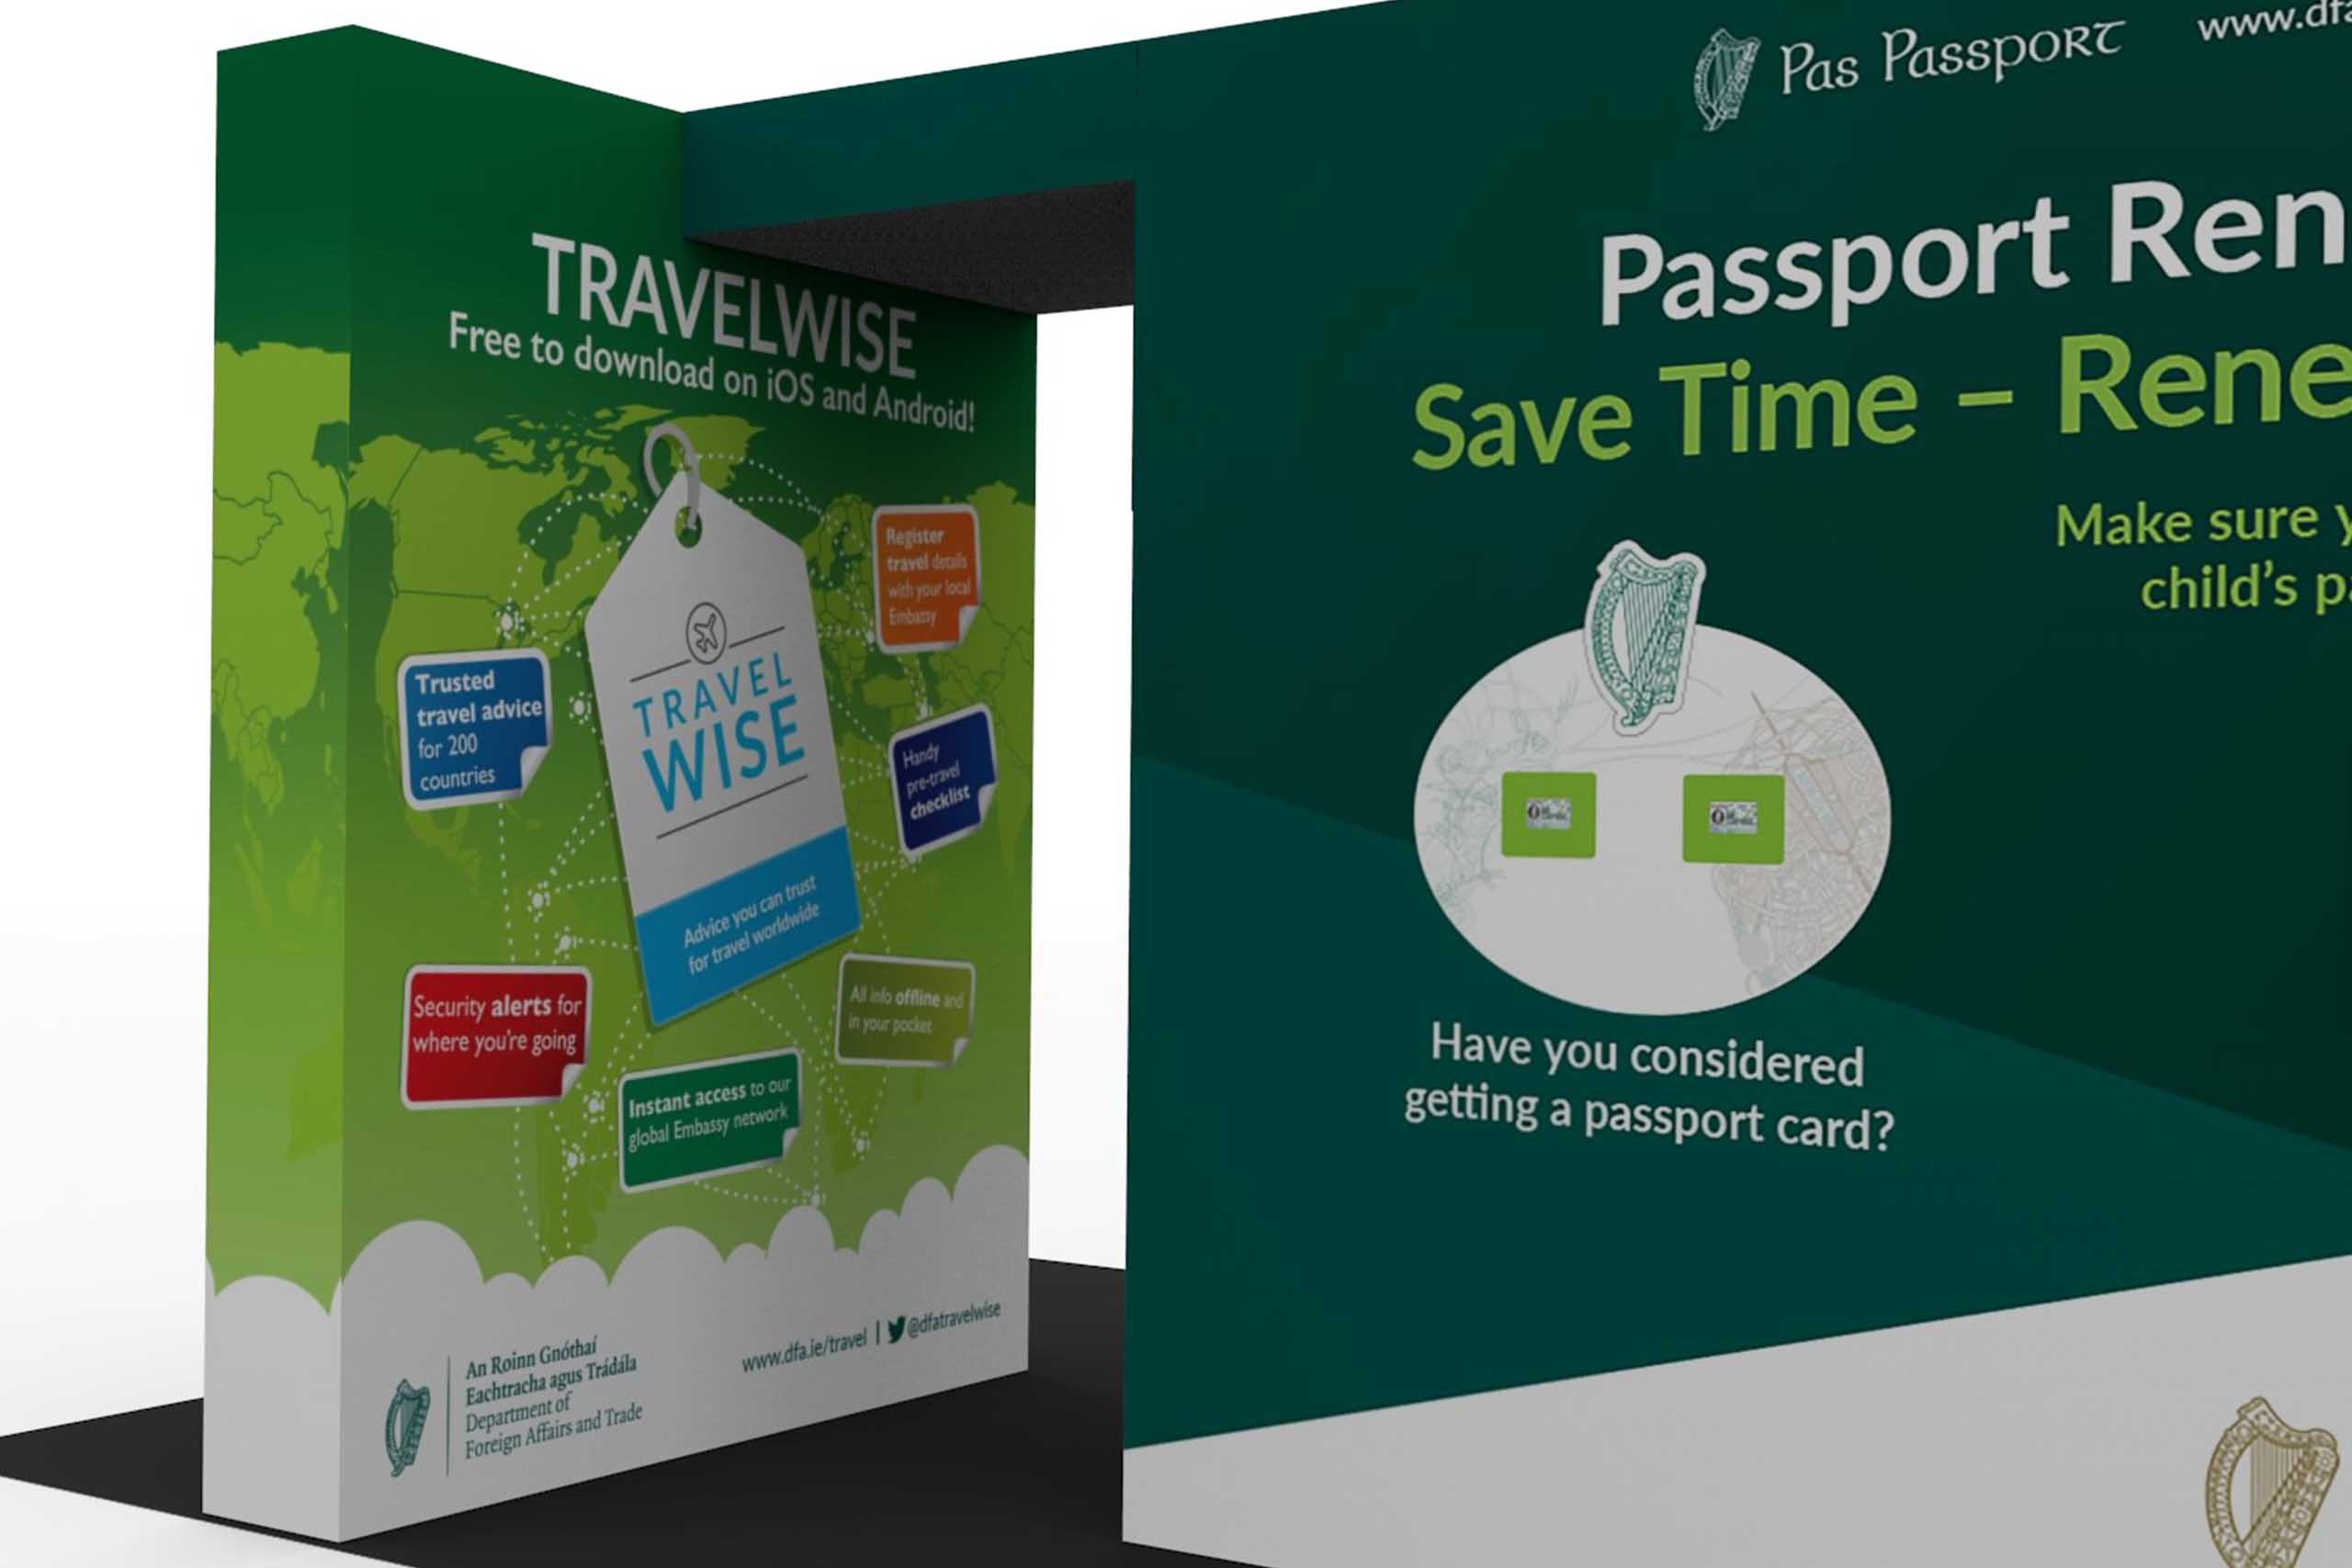 Passport Services Stand 01